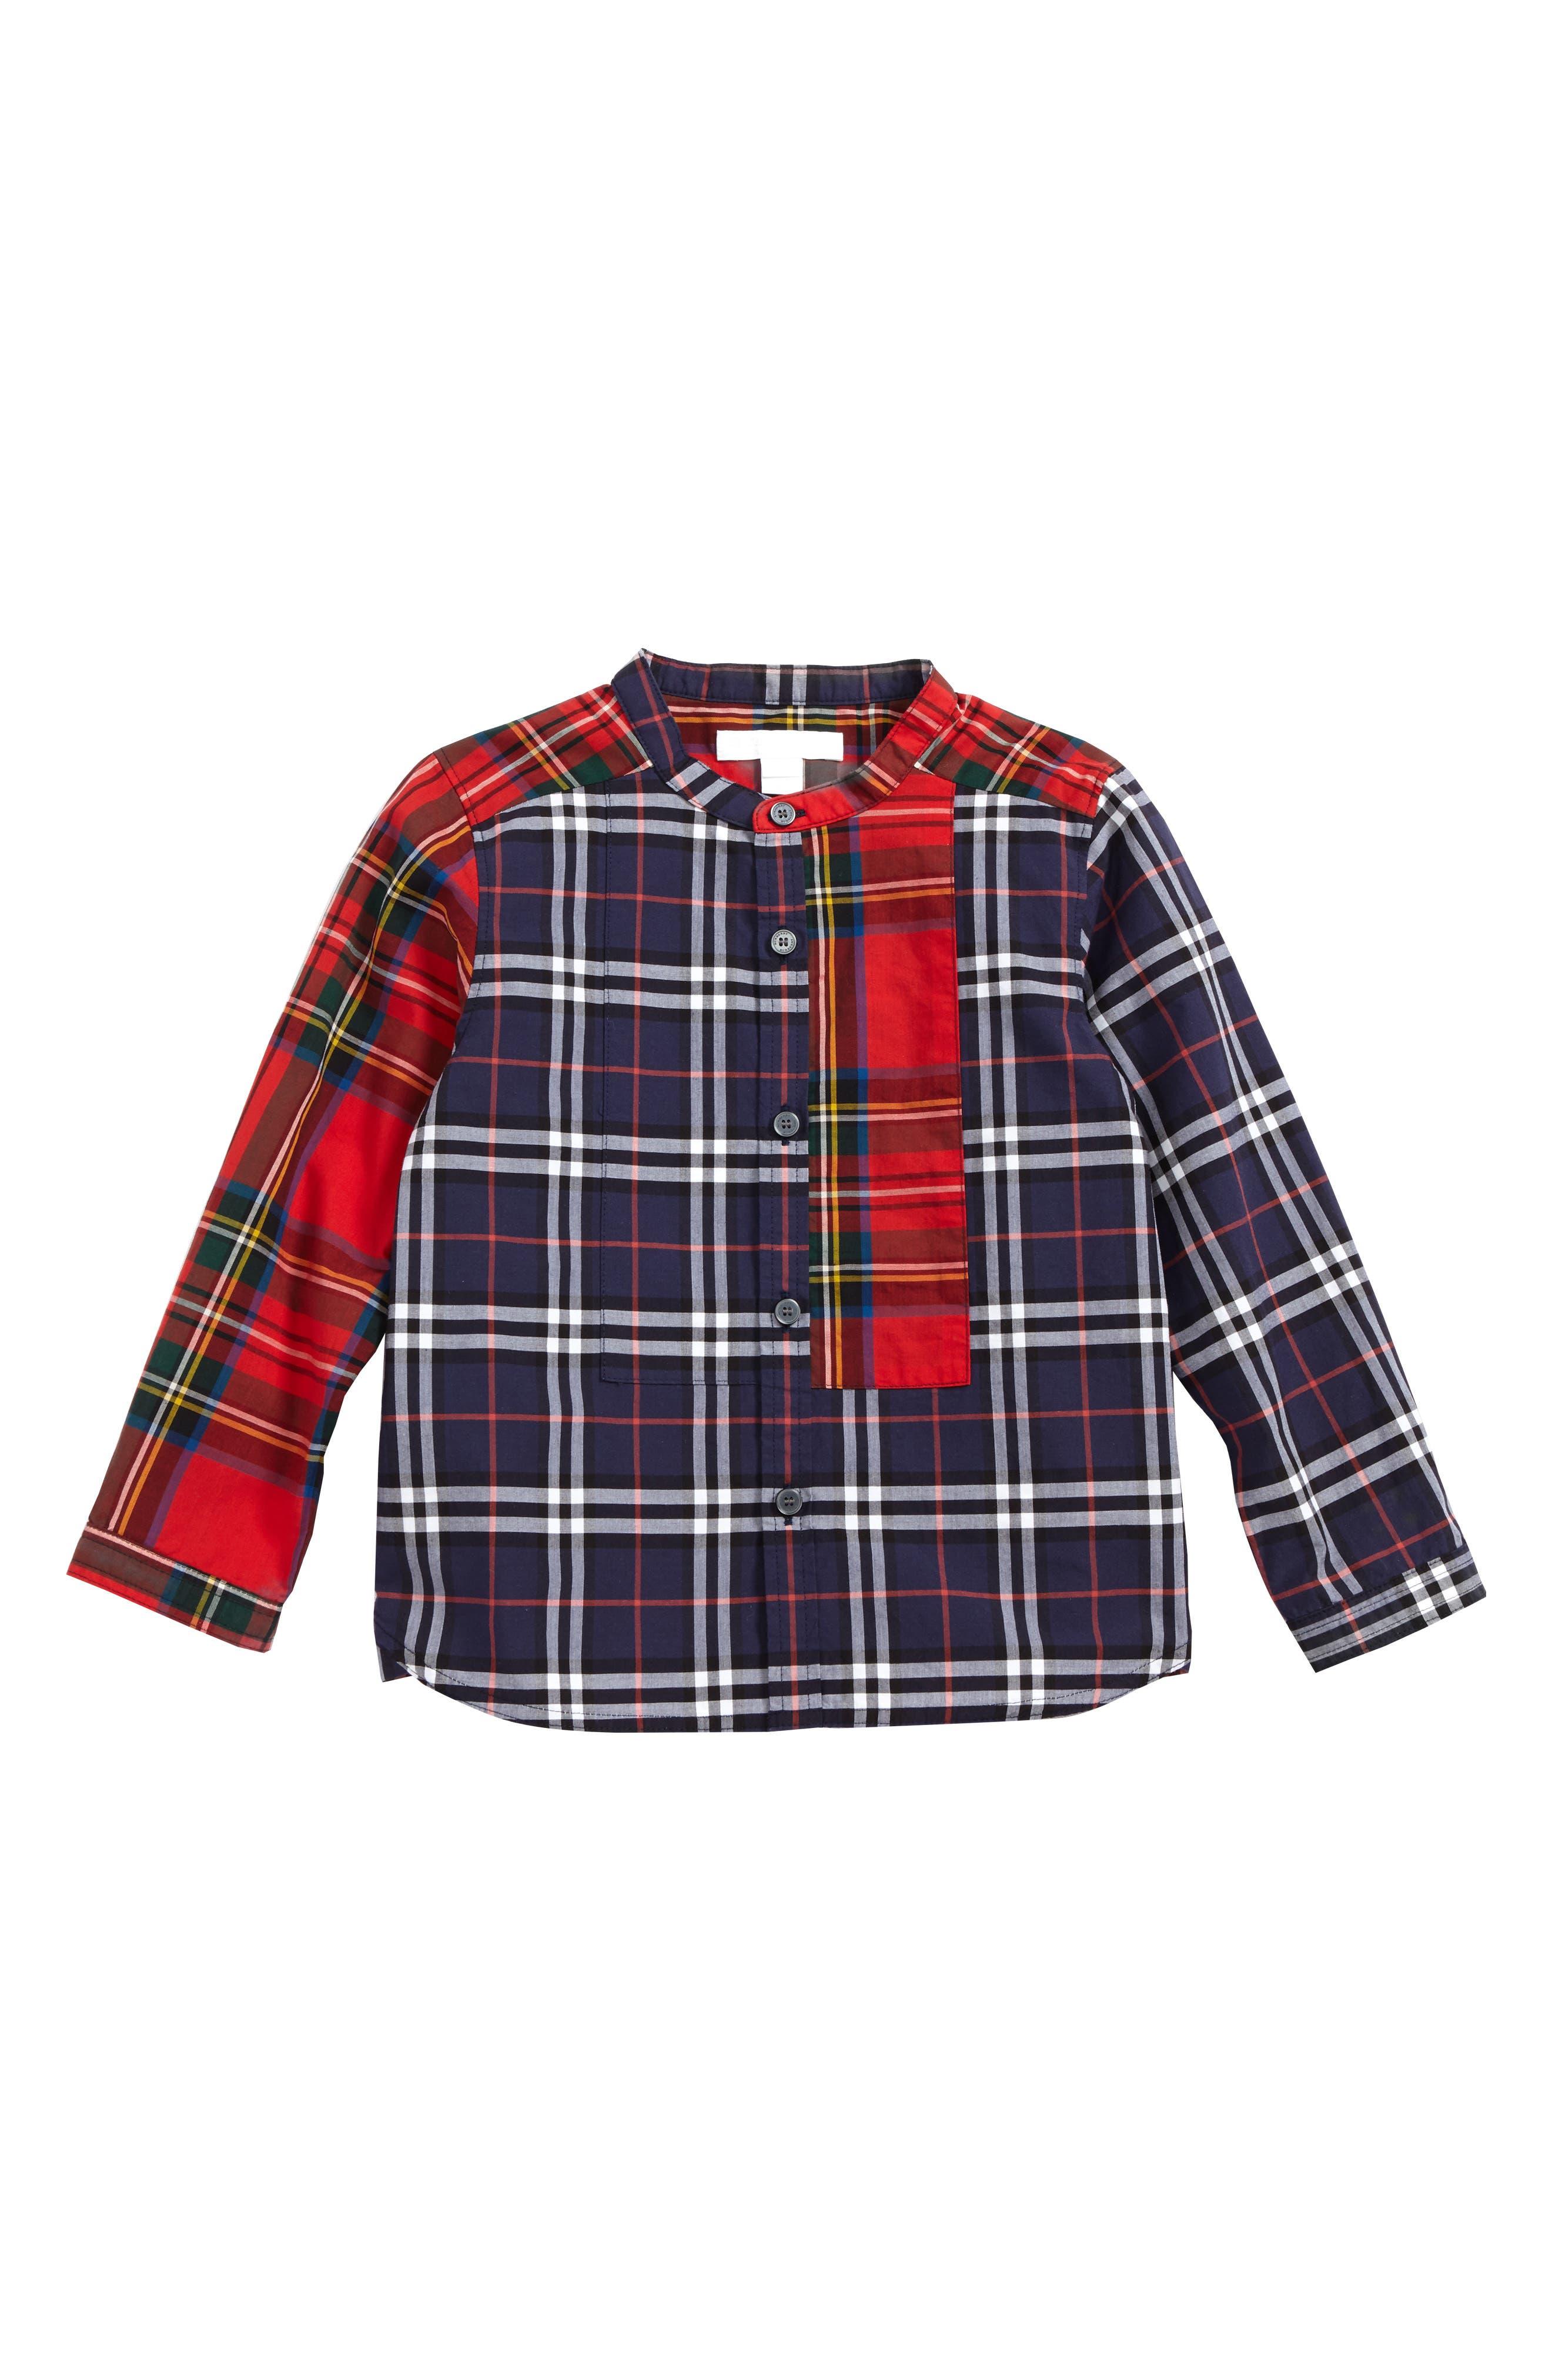 Main Image - Burberry Argus Check Print Woven Shirt (Baby Boys)